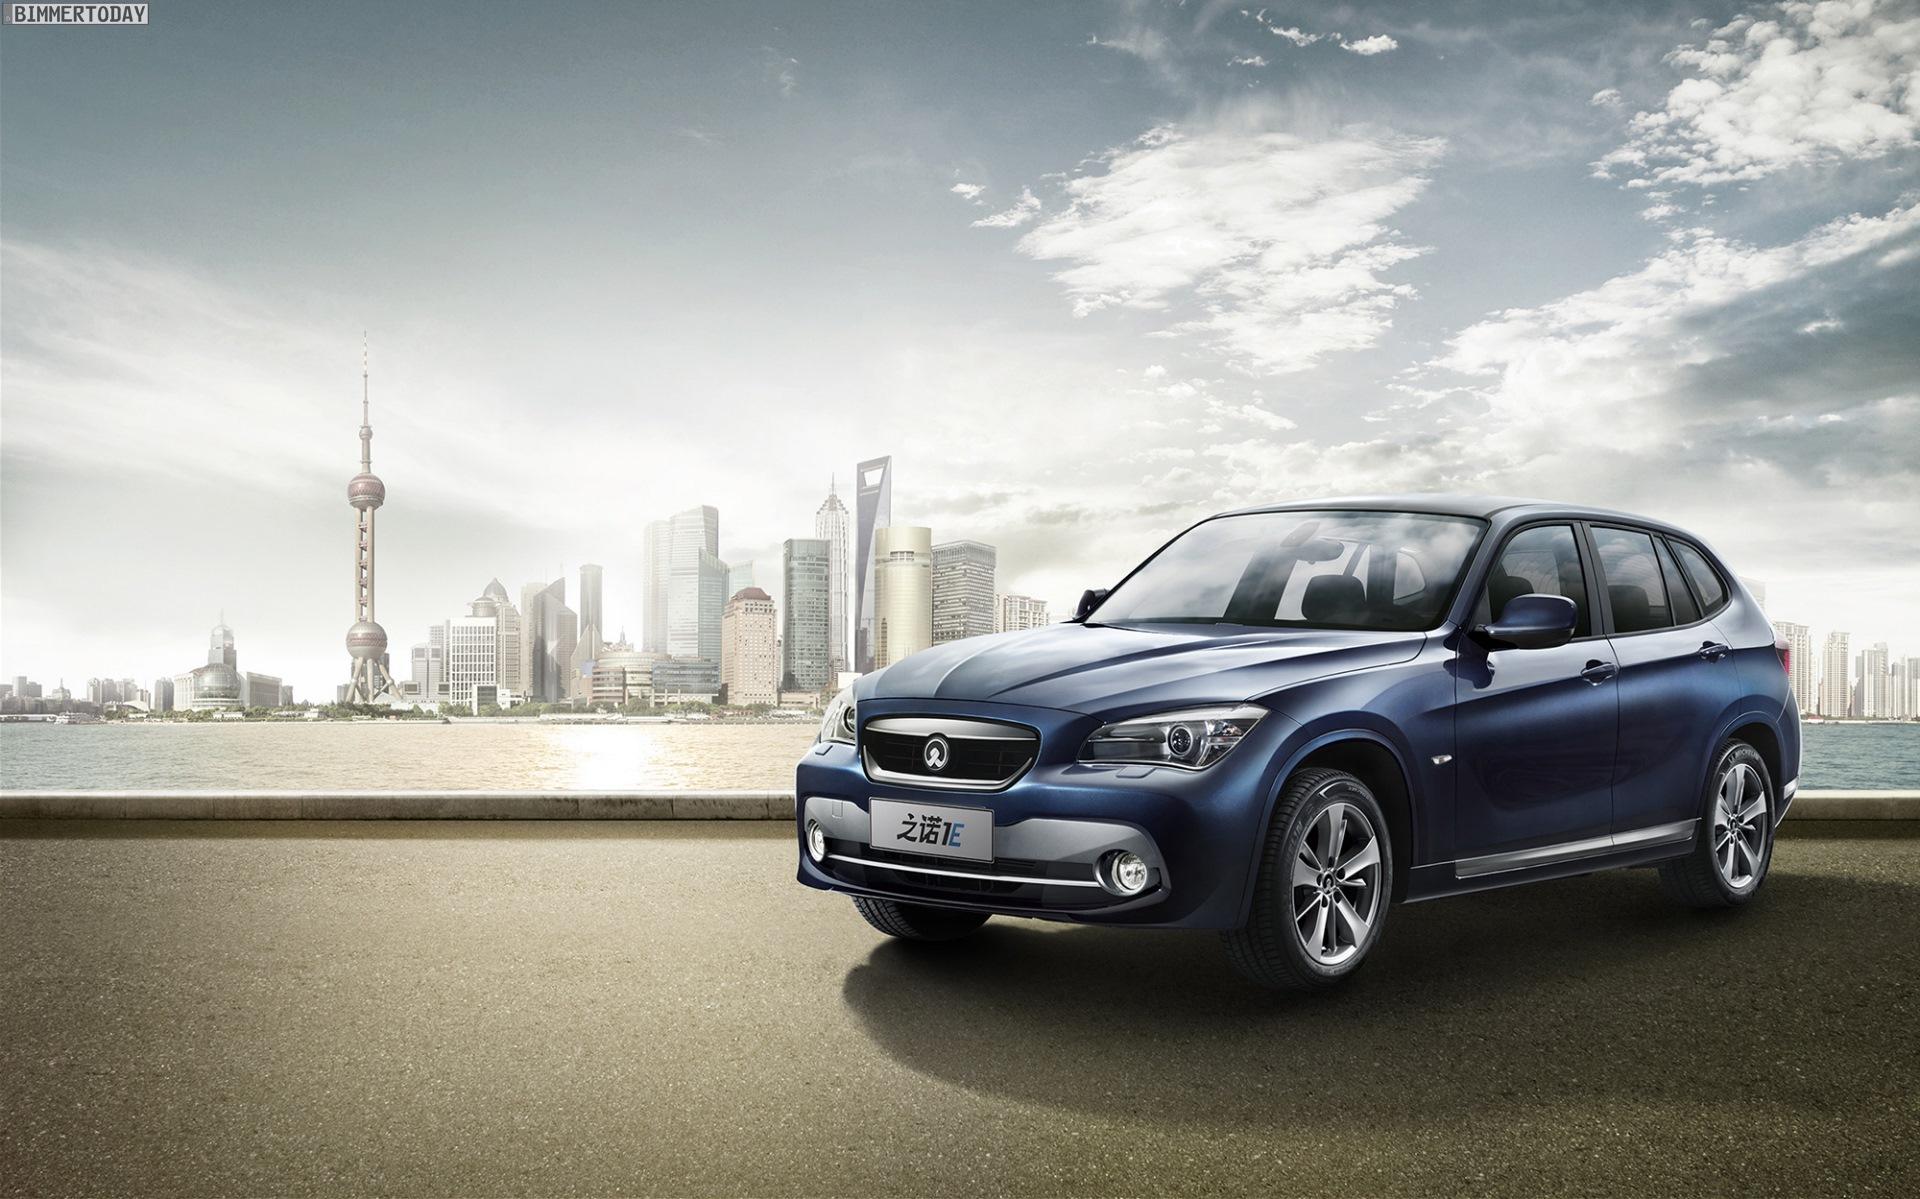 Zinoro 1E BMW X1 China Elektro SUV Guangzhou 2013 14